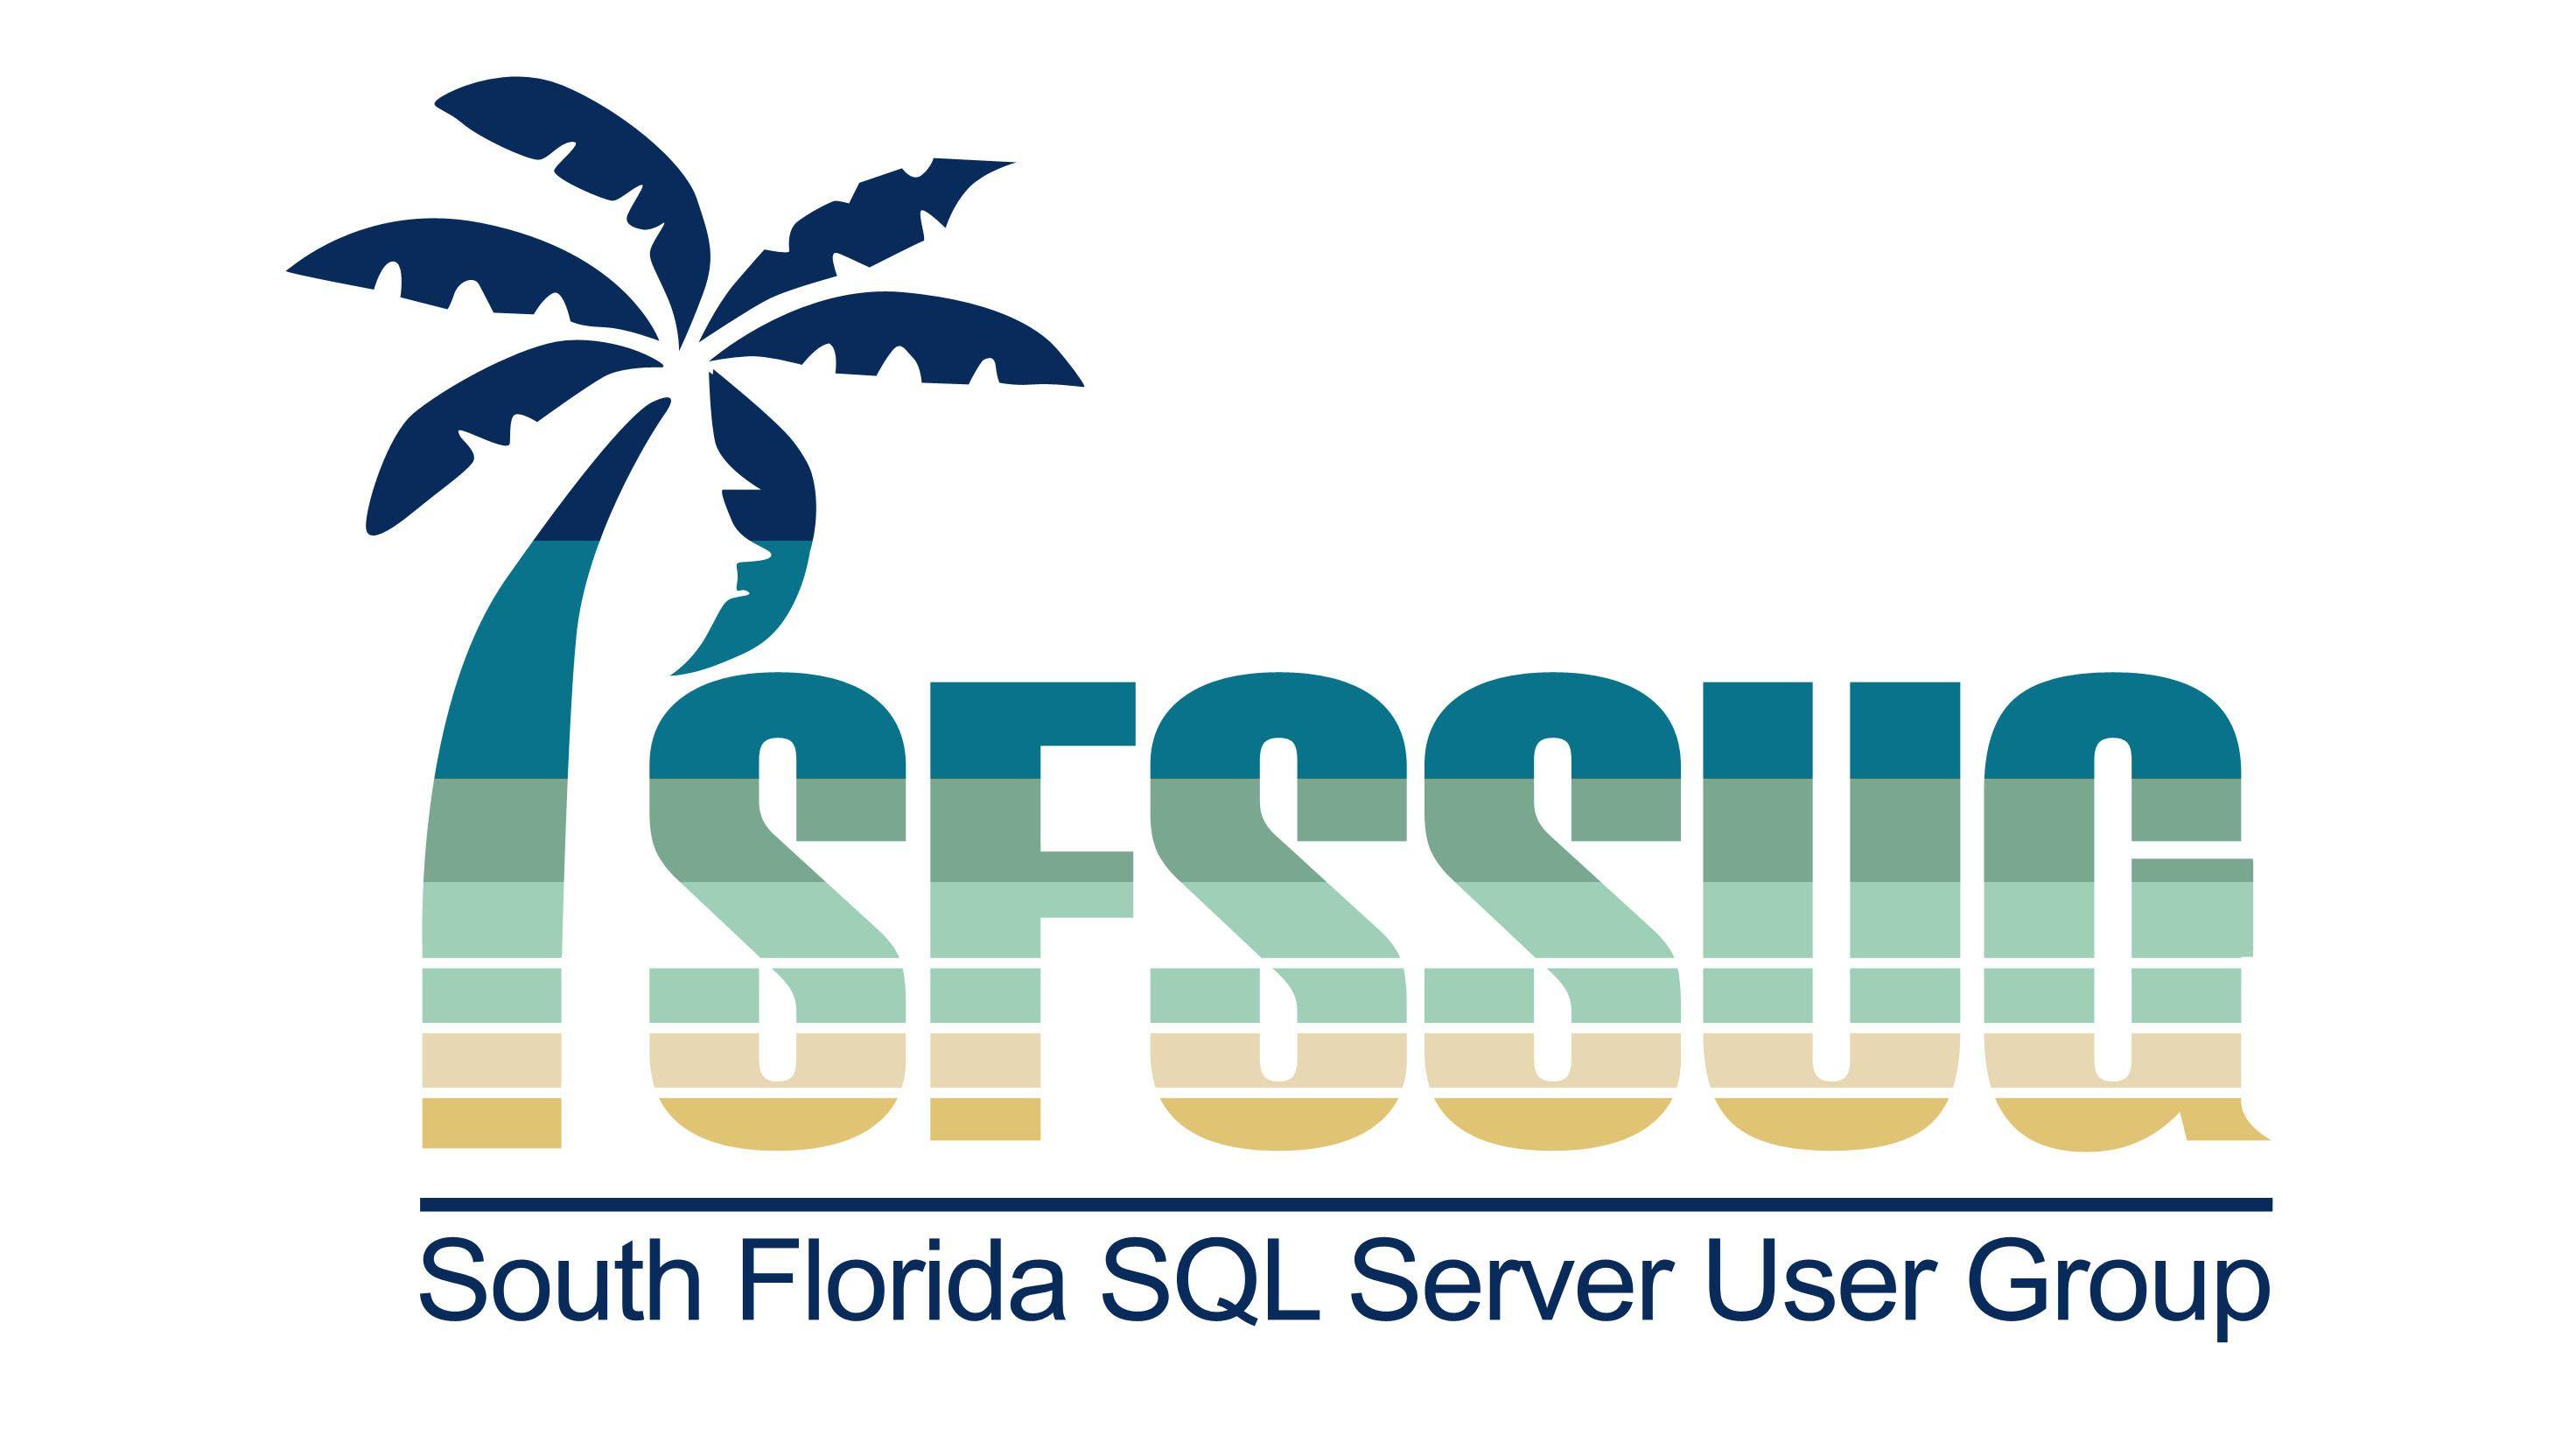 South Florida SQL Server User Group